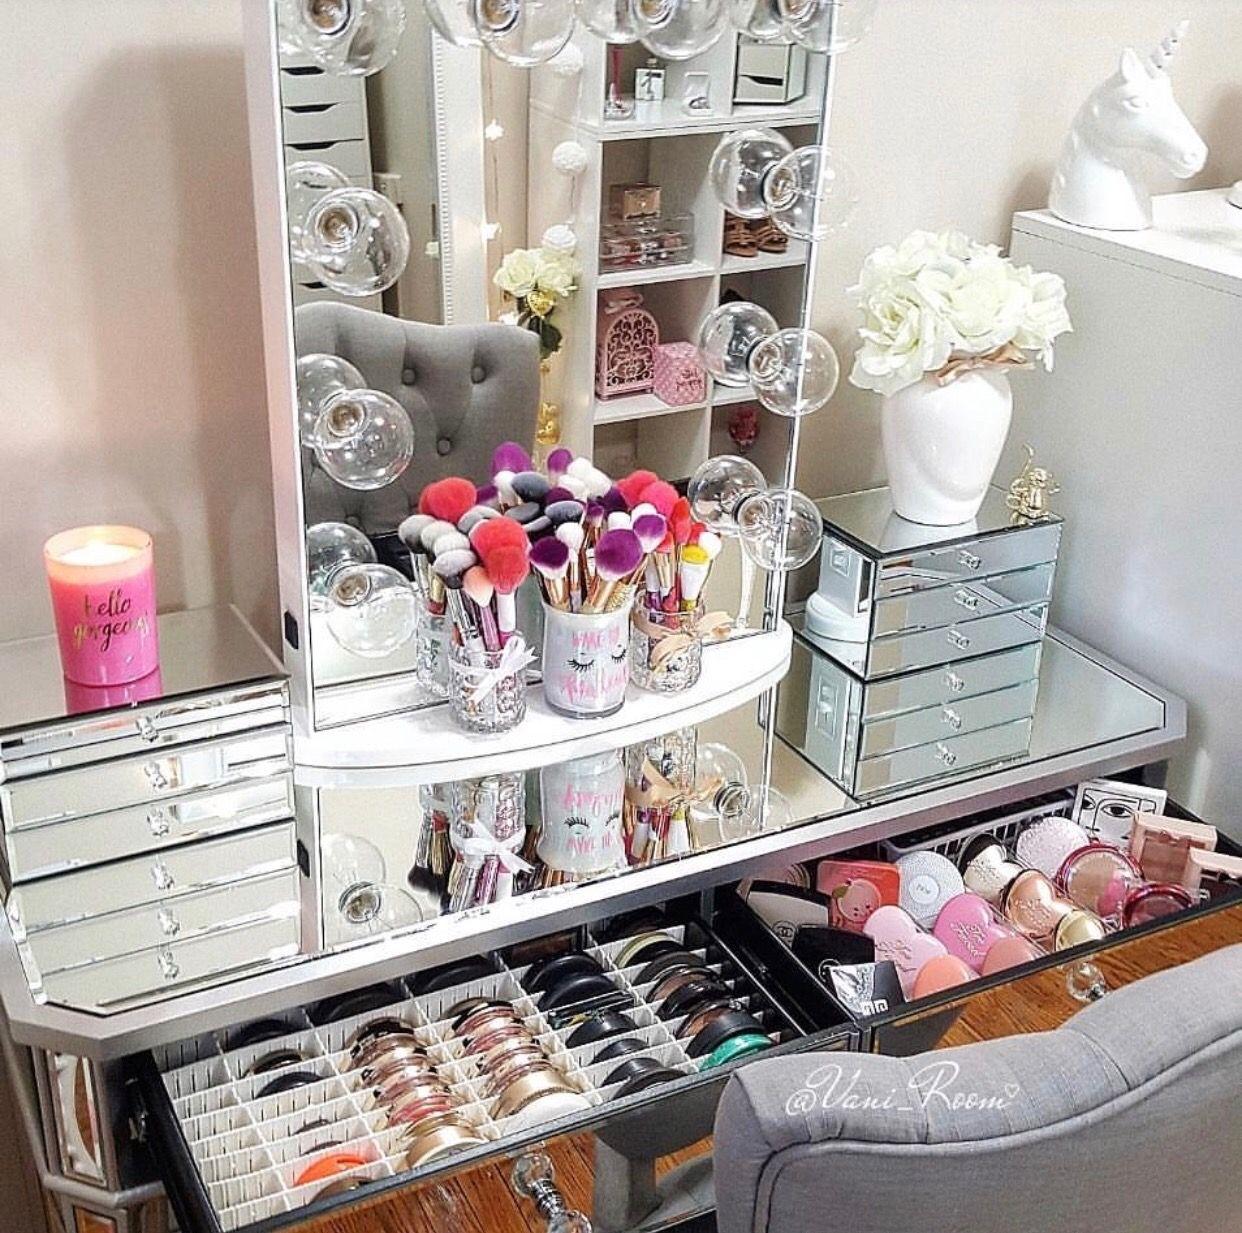 Pin by nathalia g on vanitys pinterest vanities makeup makeup organization makeup storage organization vanity room vanity fair vanity tables beauty room guest bedrooms organizers geotapseo Images